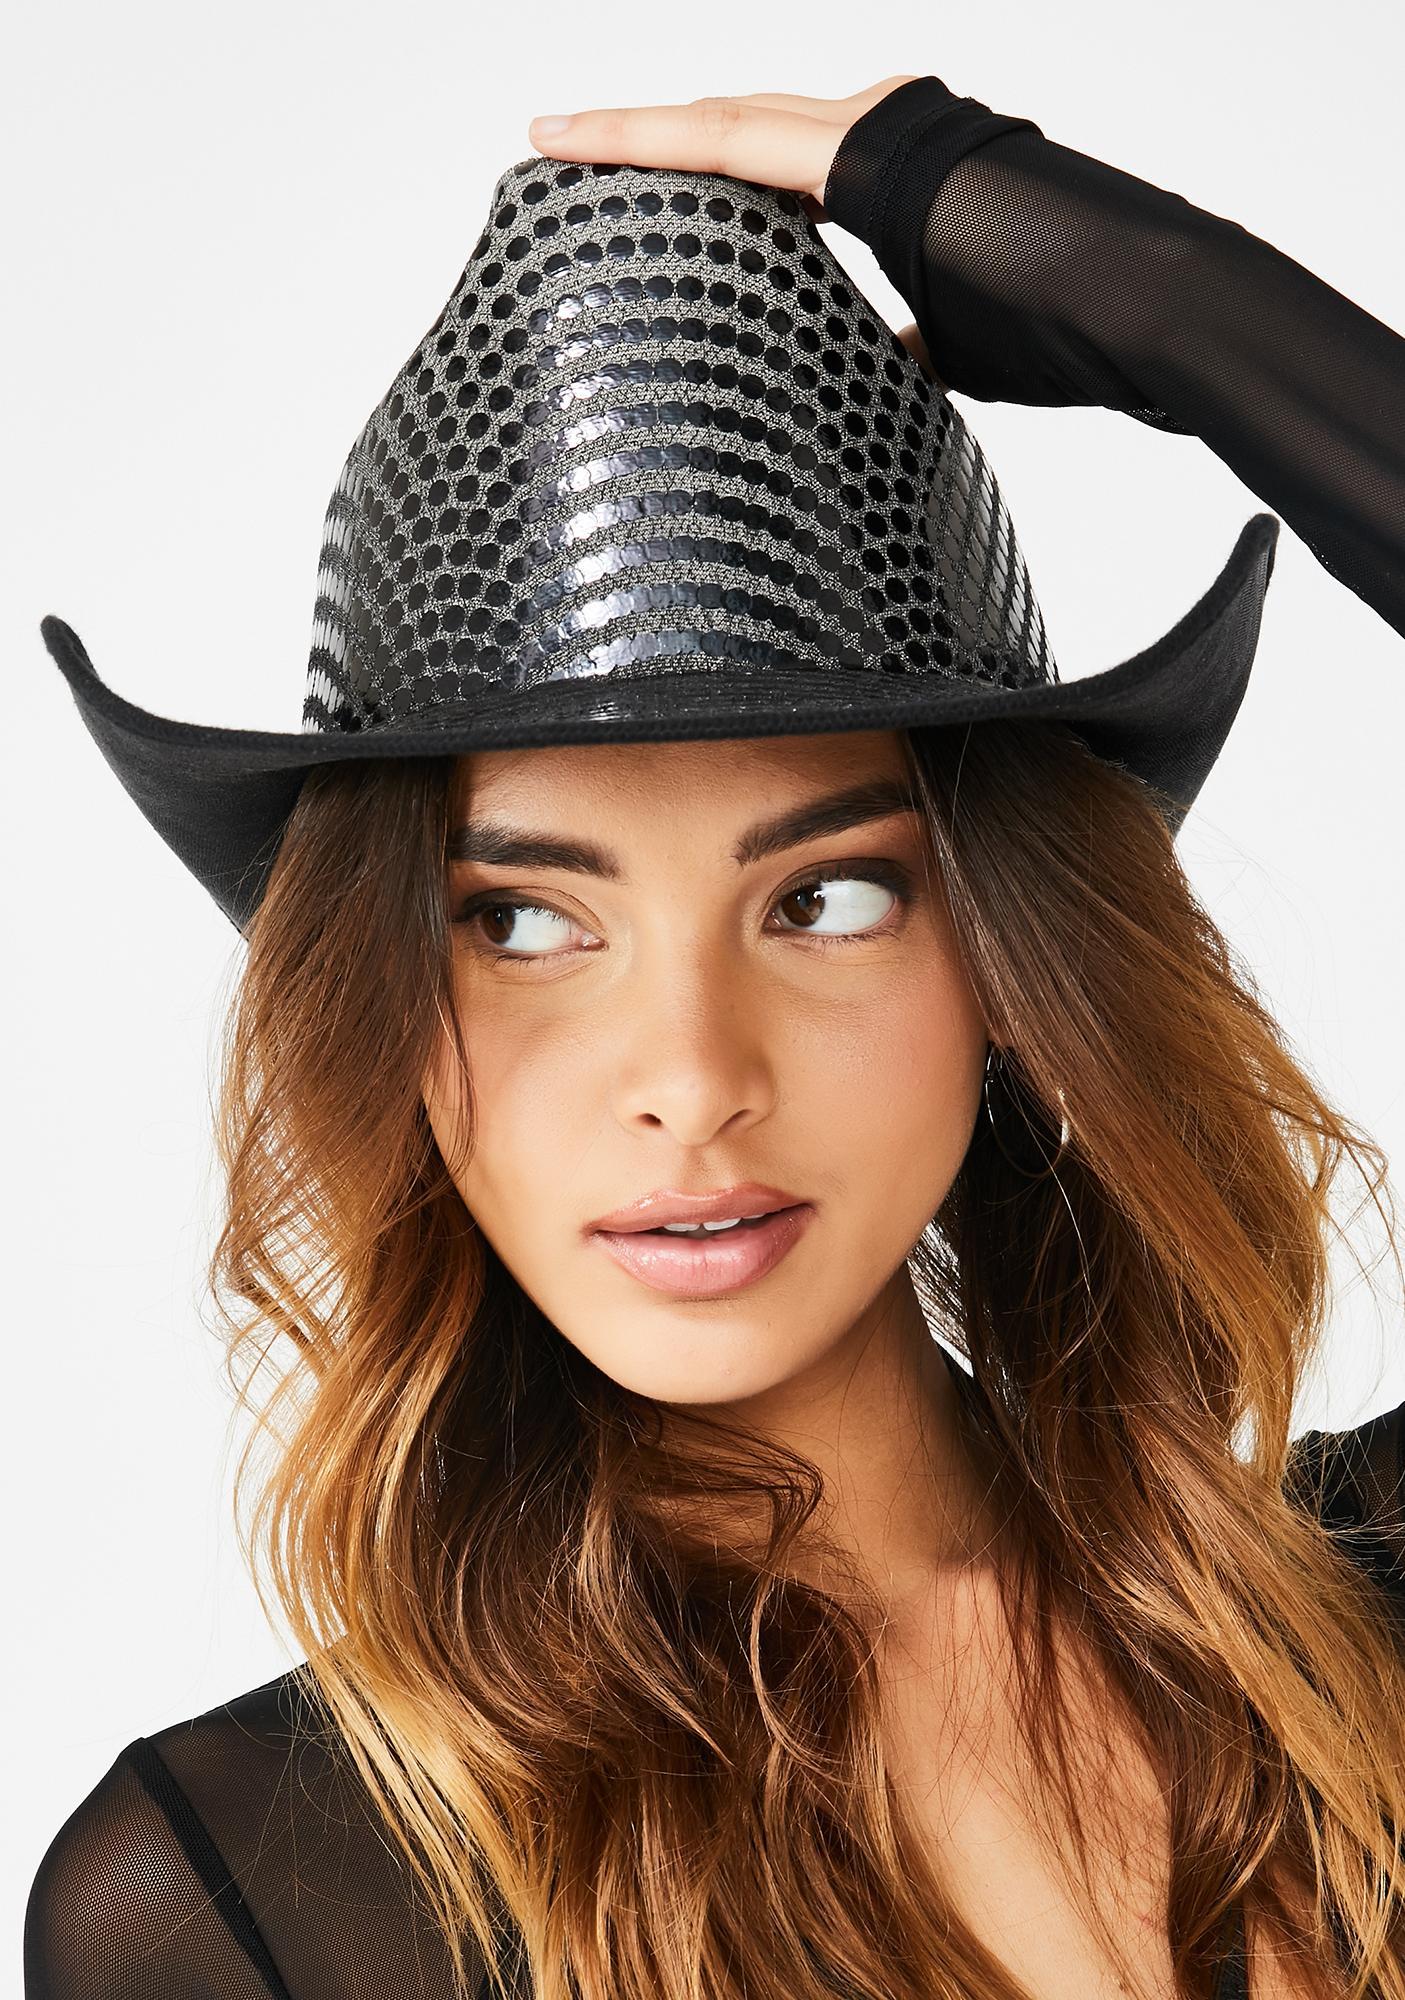 Replay Vintage Sunglasses Disco Belle Sequin Cowboy Hat